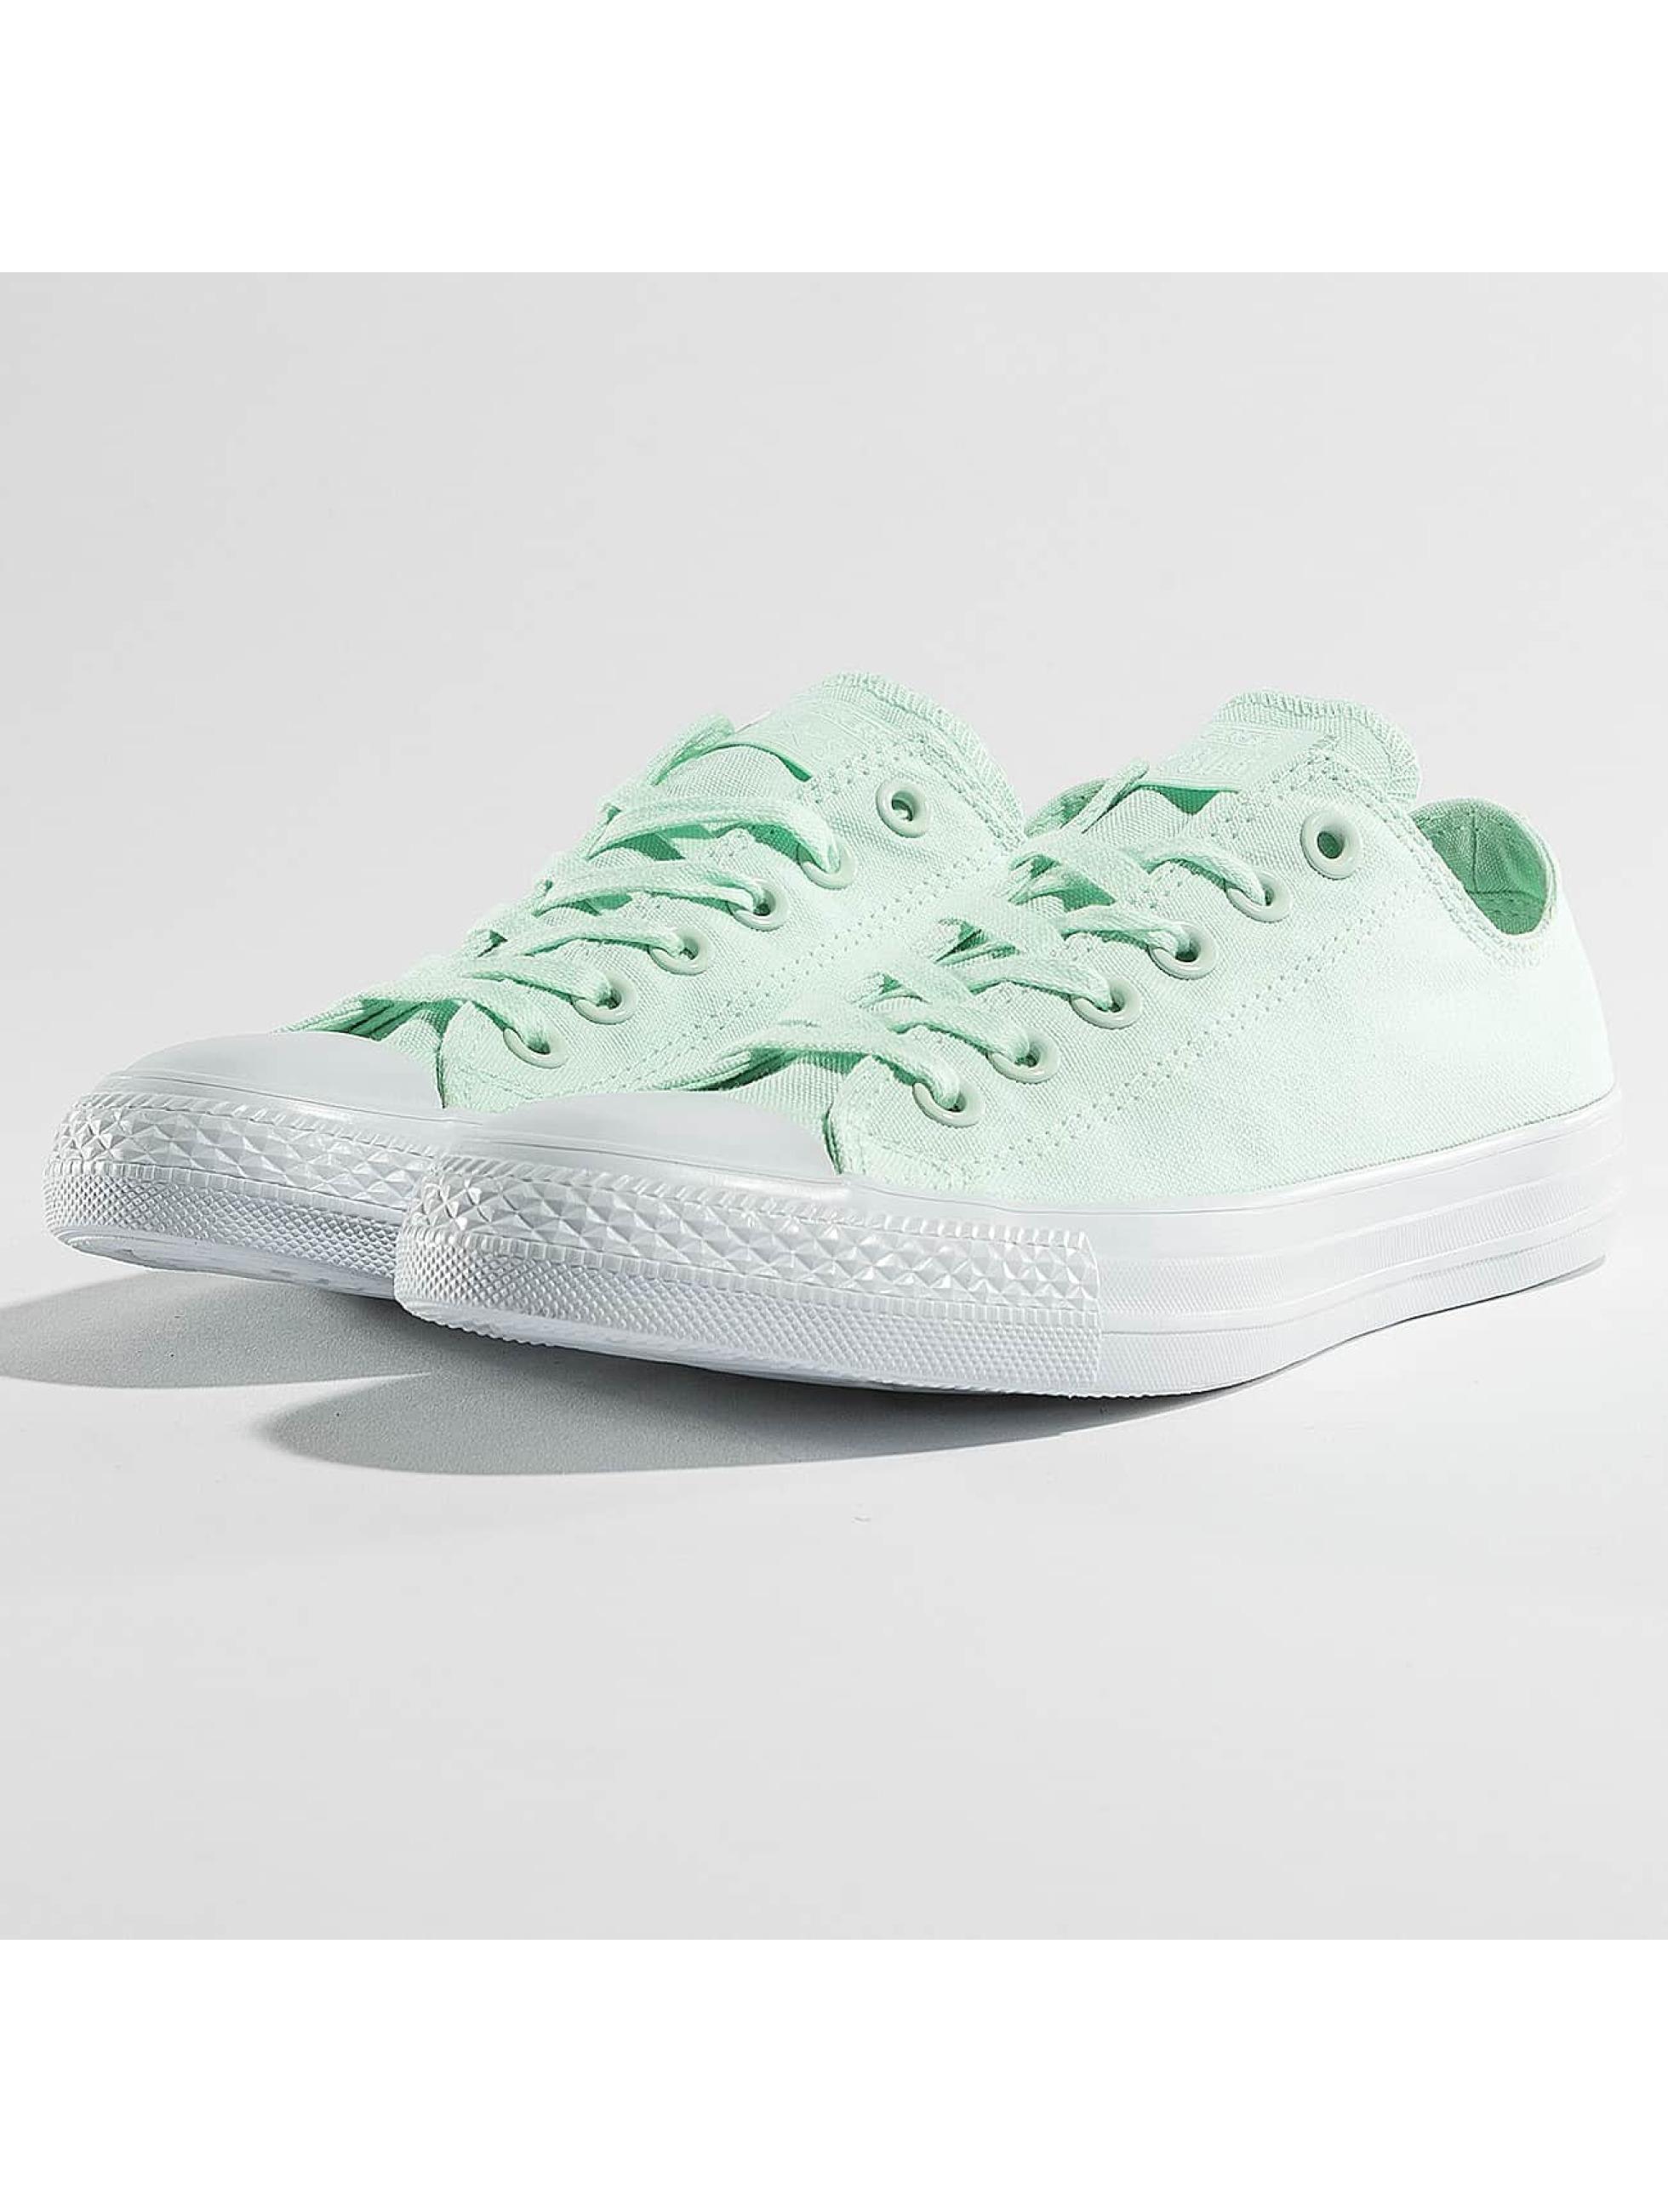 Converse Frauen Sneaker Chuck Taylor All Star in grün